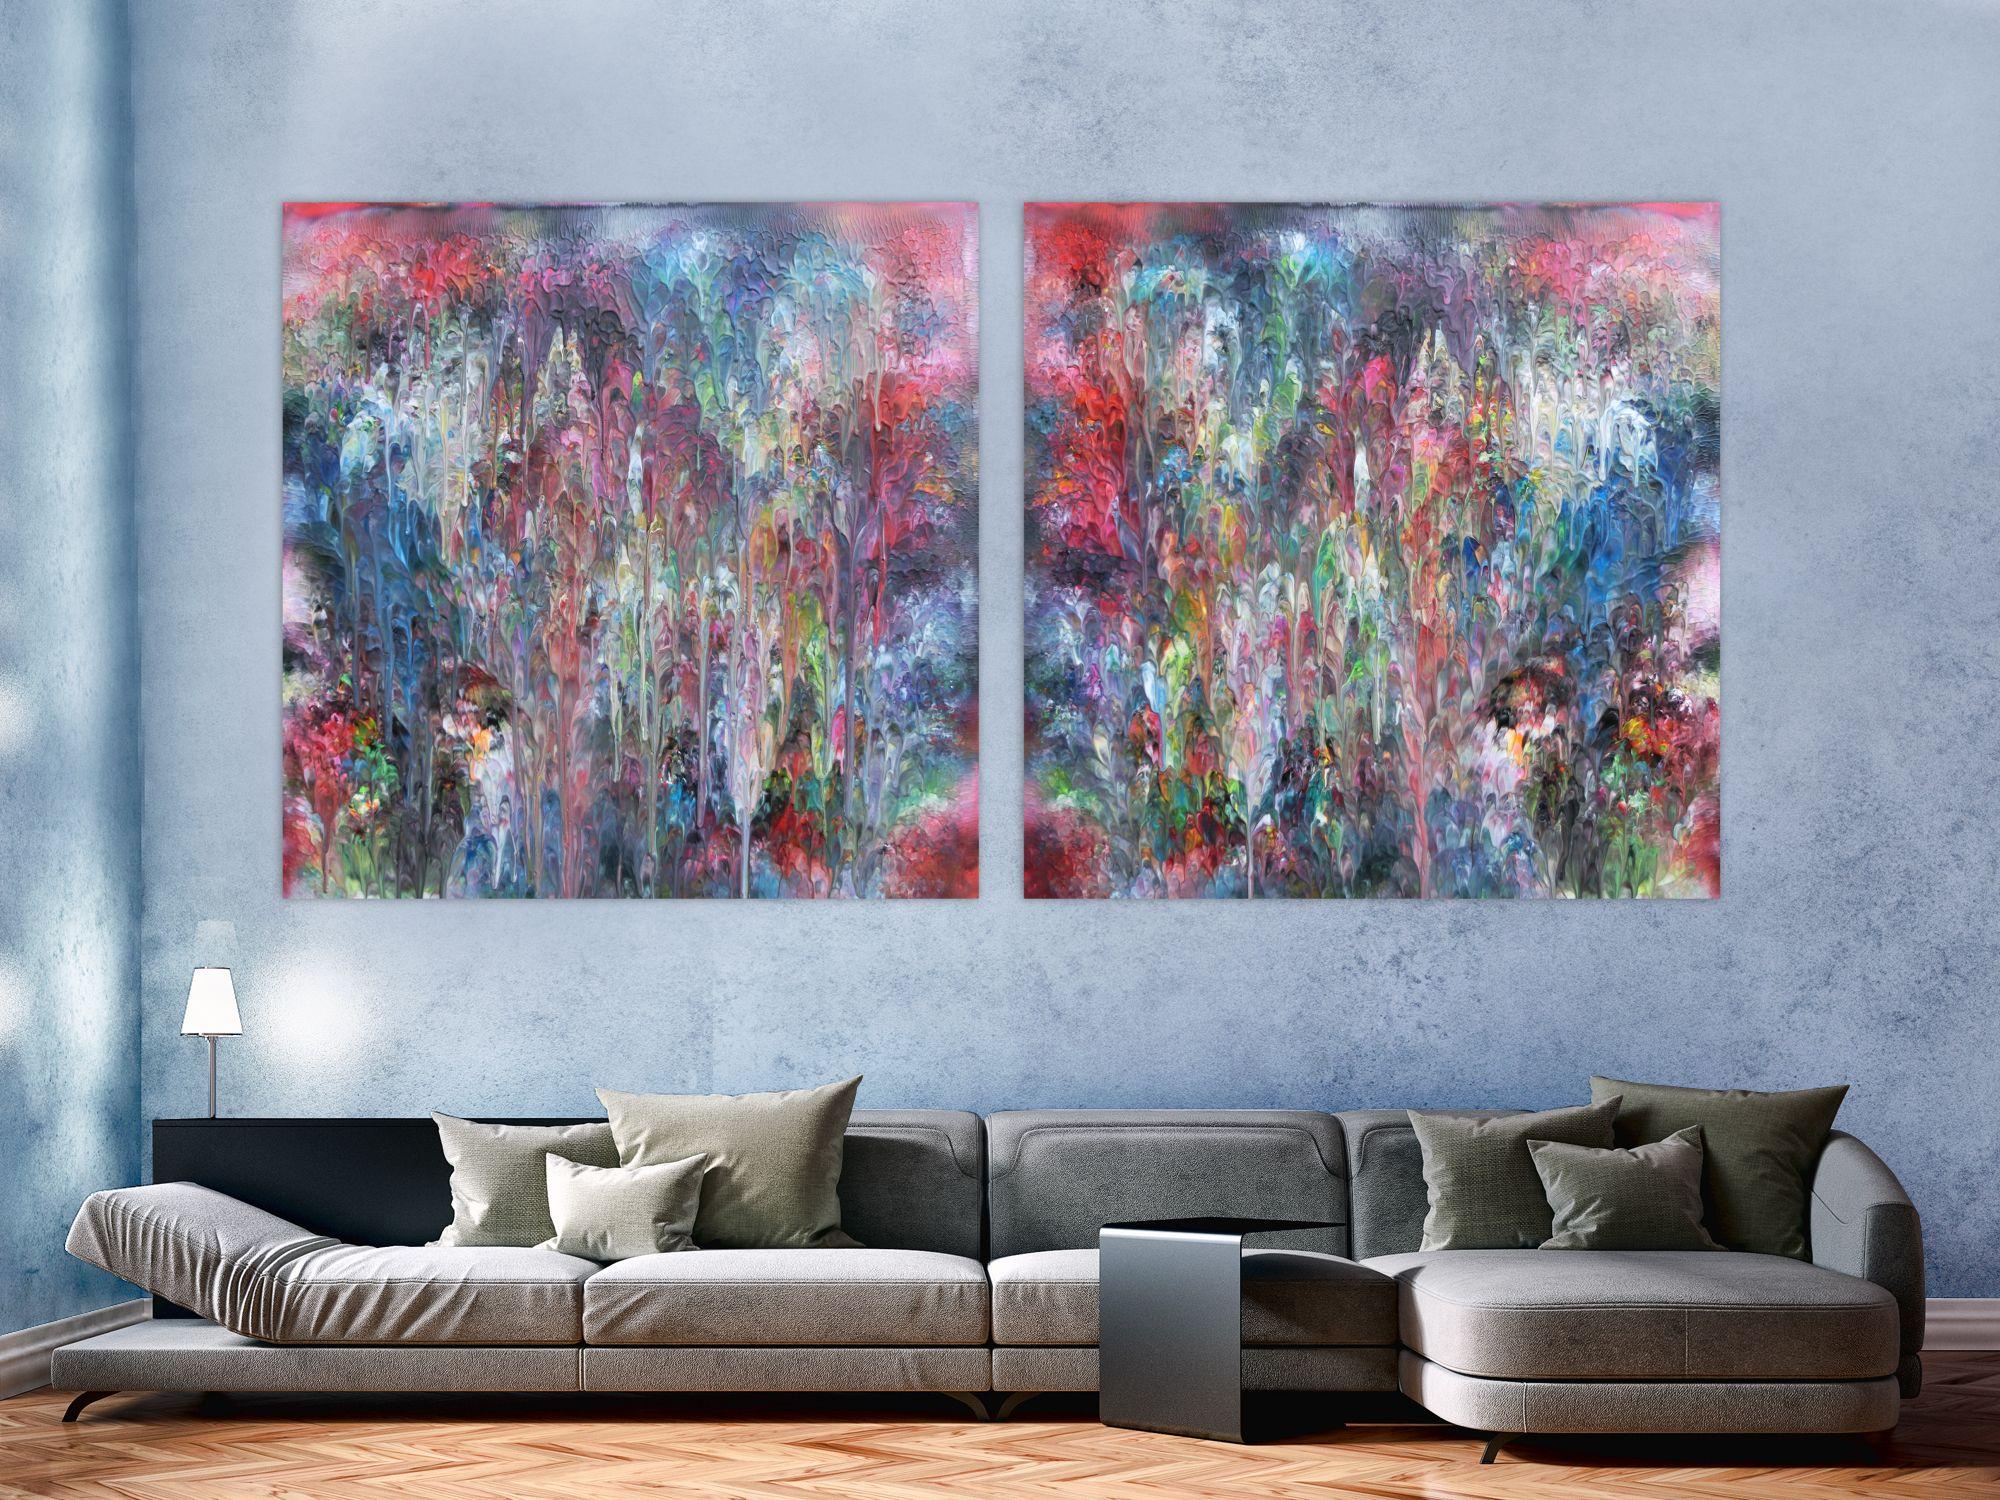 pin auf abstract art abstrakt bilder malen moderne malerei